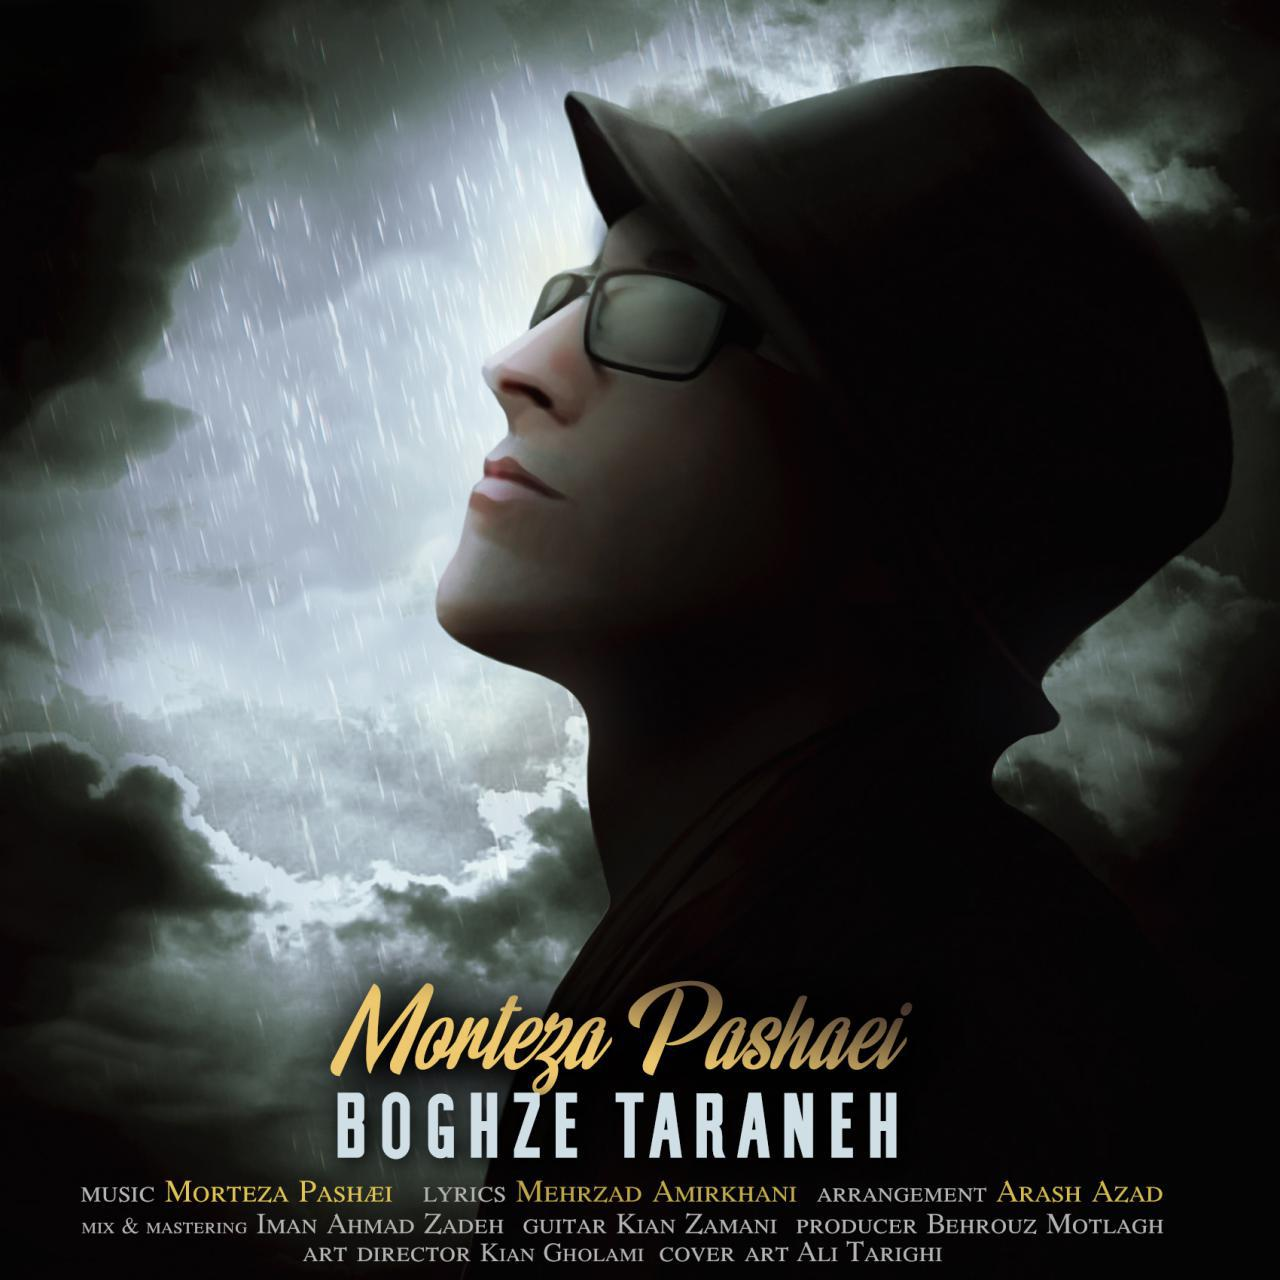 Morteza Pashaei - Boghze Taraneh Music | آهنگ مرتضی پاشایی - بغض ترانه